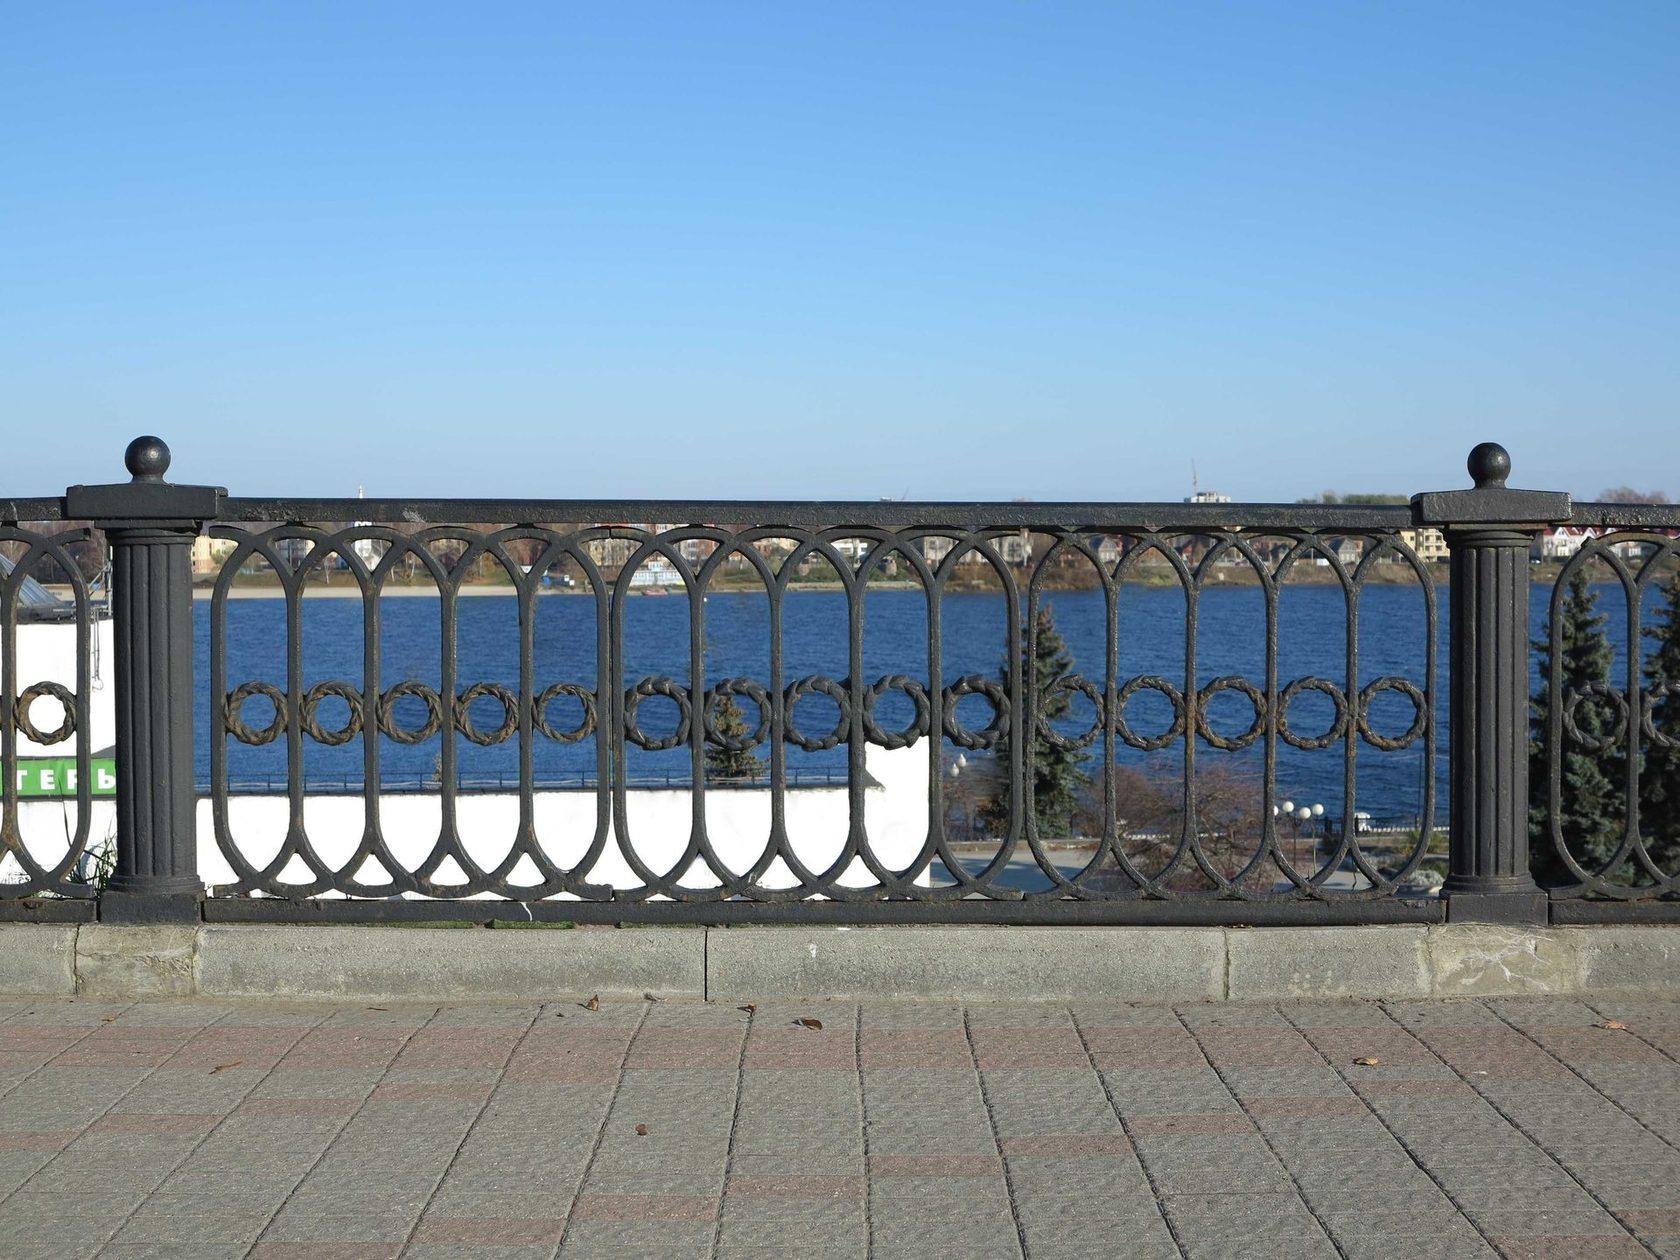 железобетонному столбу ограды набережных москва реки фото картинки фото